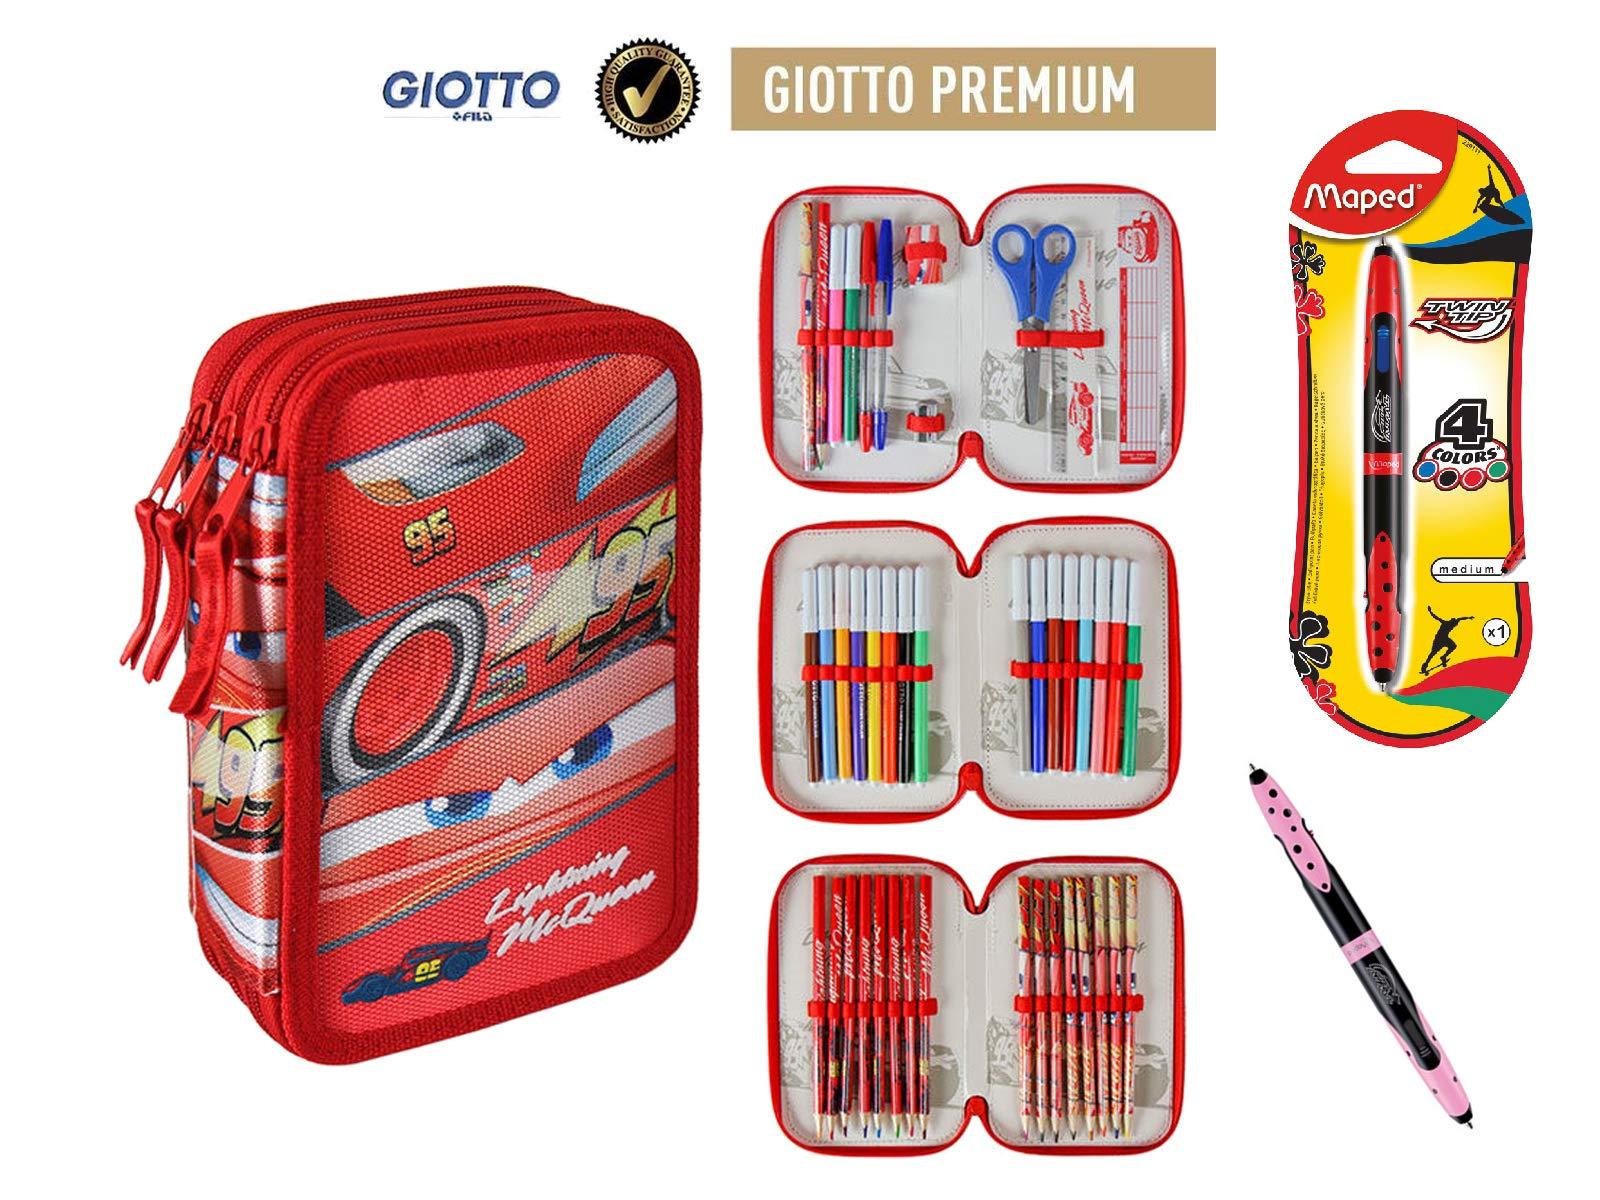 Plumier estuche cremallera triple 3 pisos Cars 43 piezas contenido Giotto + REGALO 12 Rotuladores BIC Kids